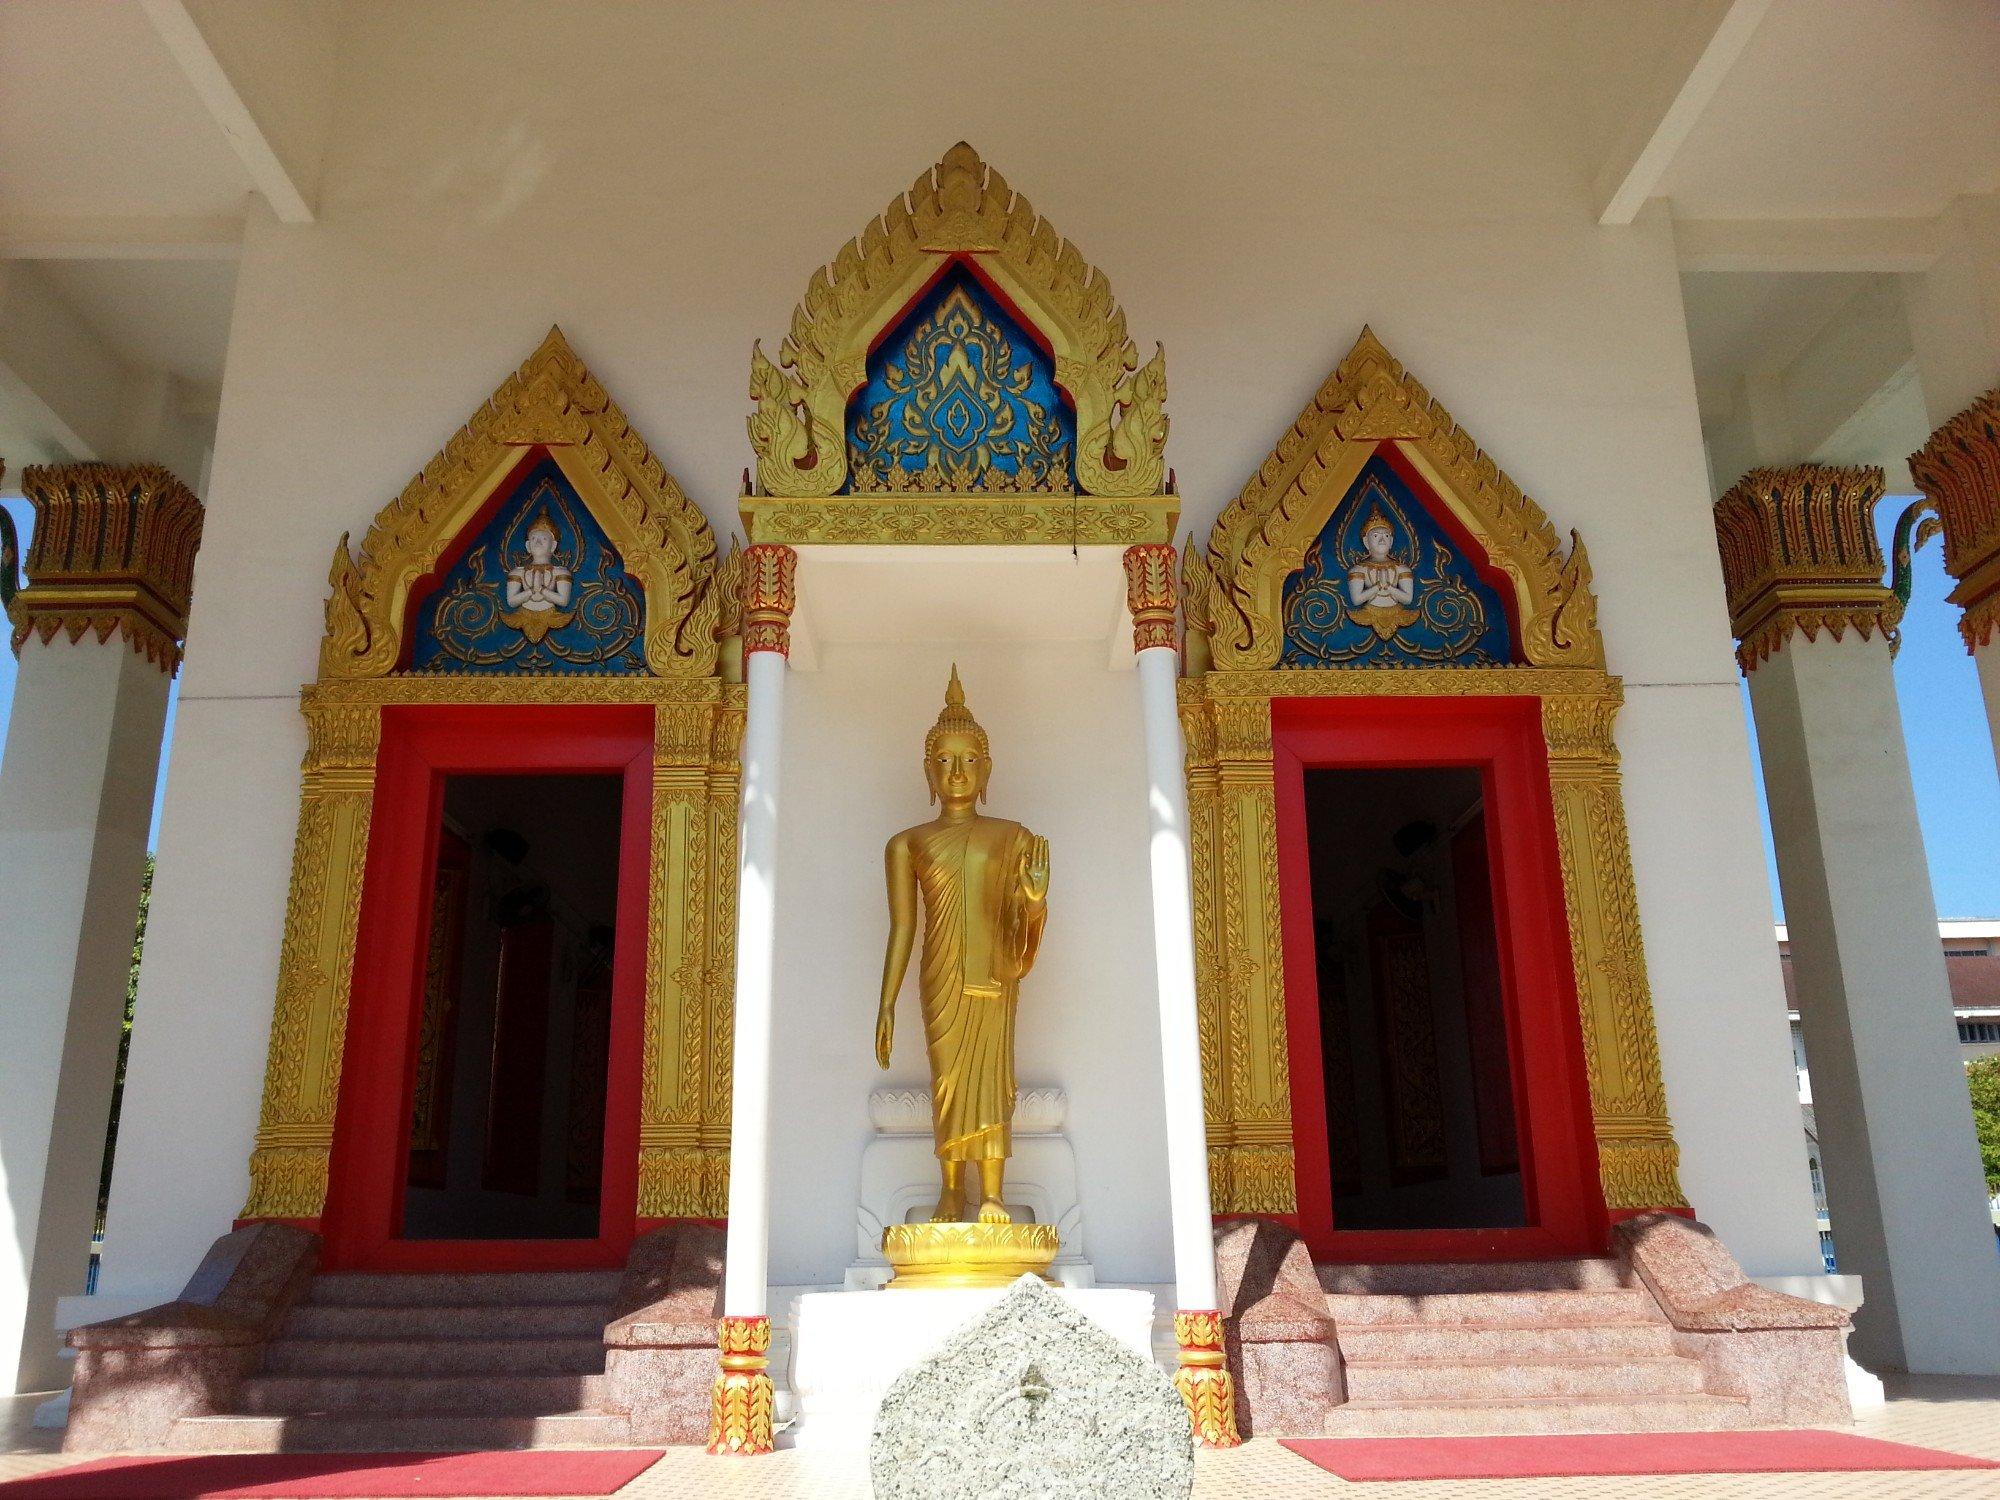 Entrance to the shrine hall at Wat Mongkol Nimit